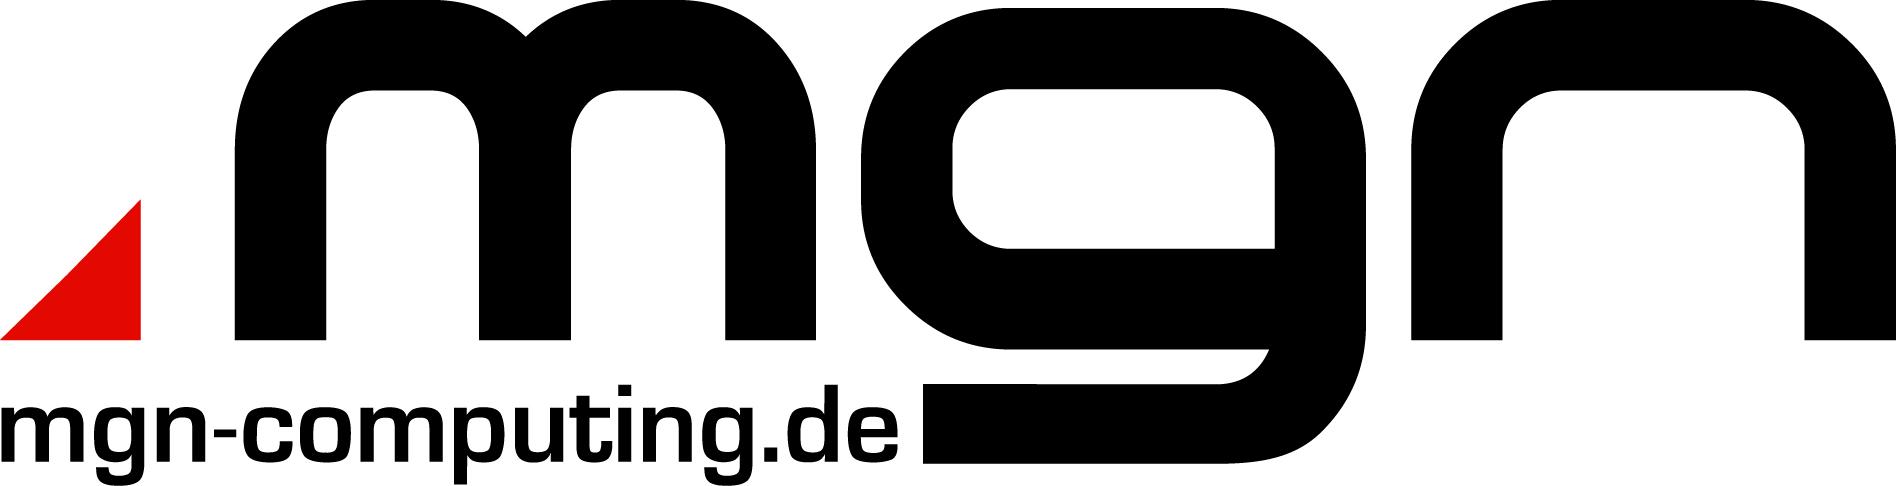 mgn-computing GmbH